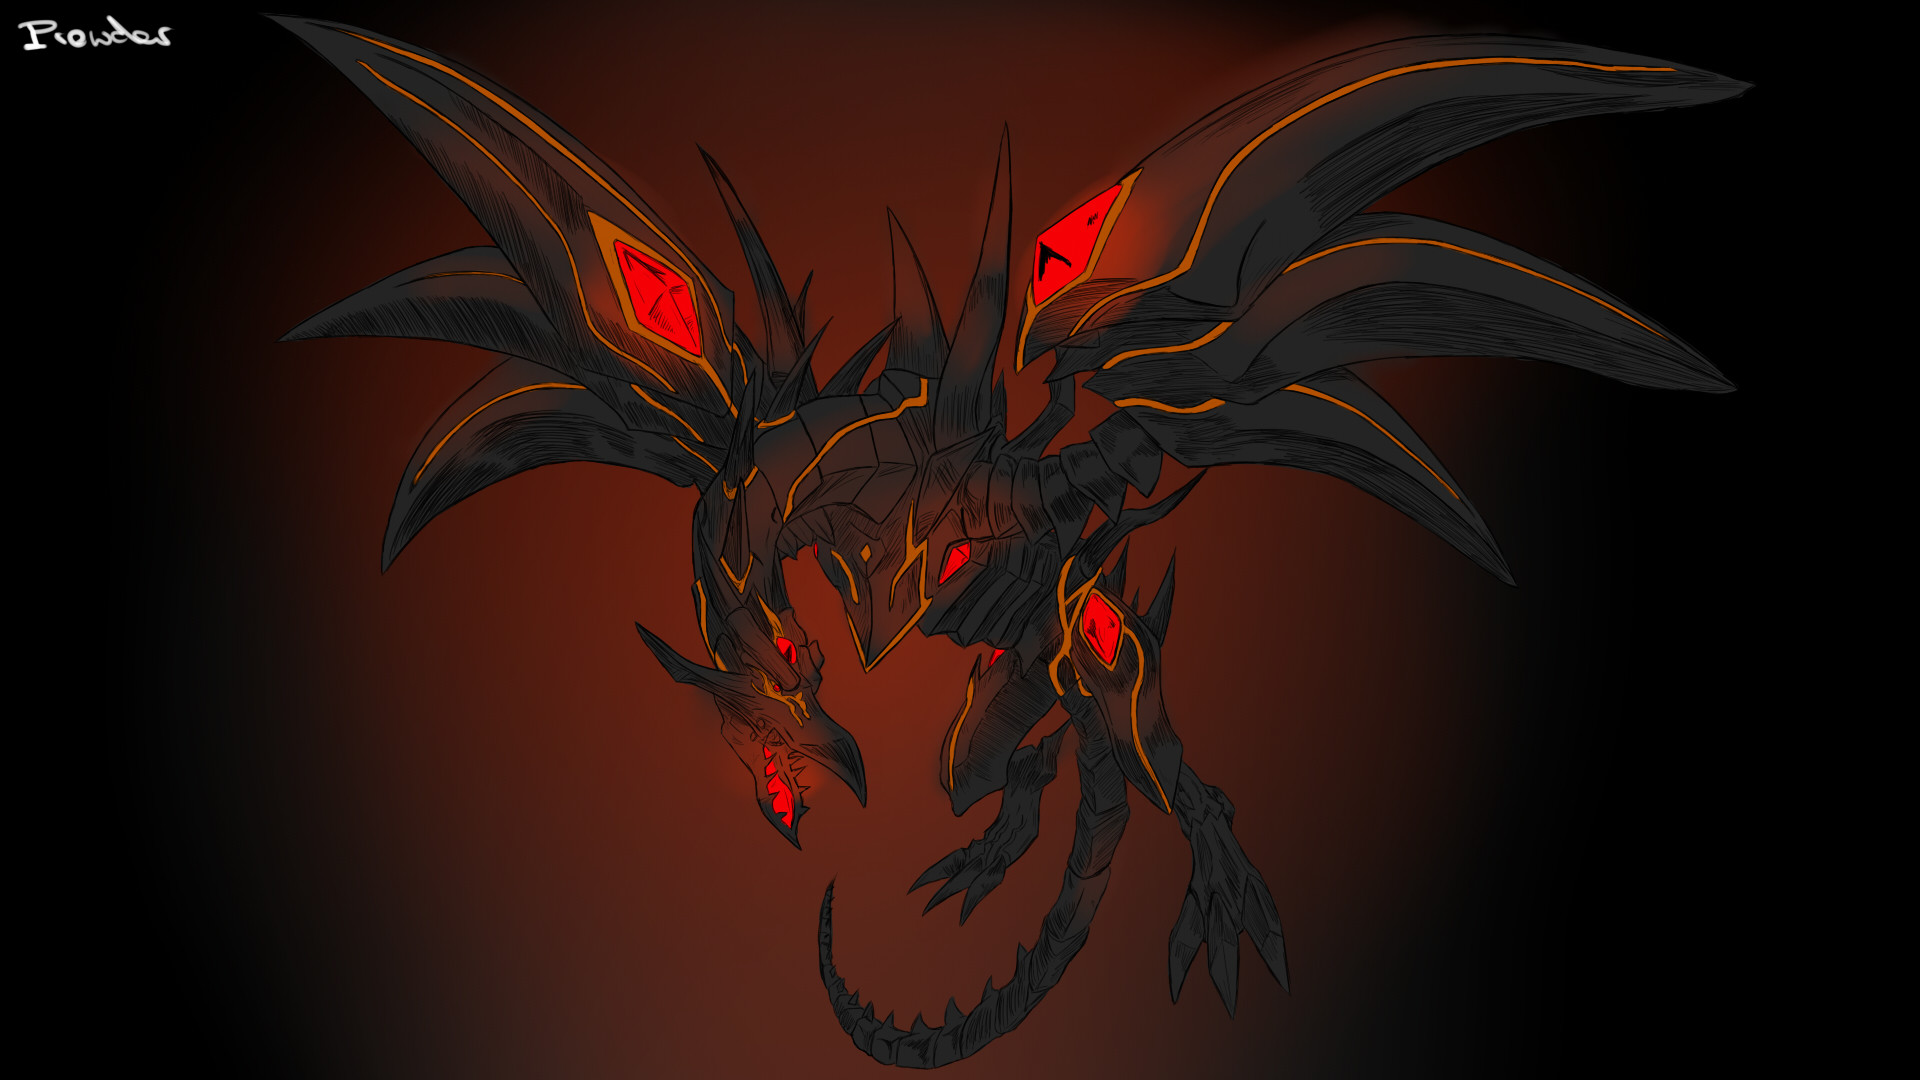 Red-Eyes Black Dragon Wallpaper HD